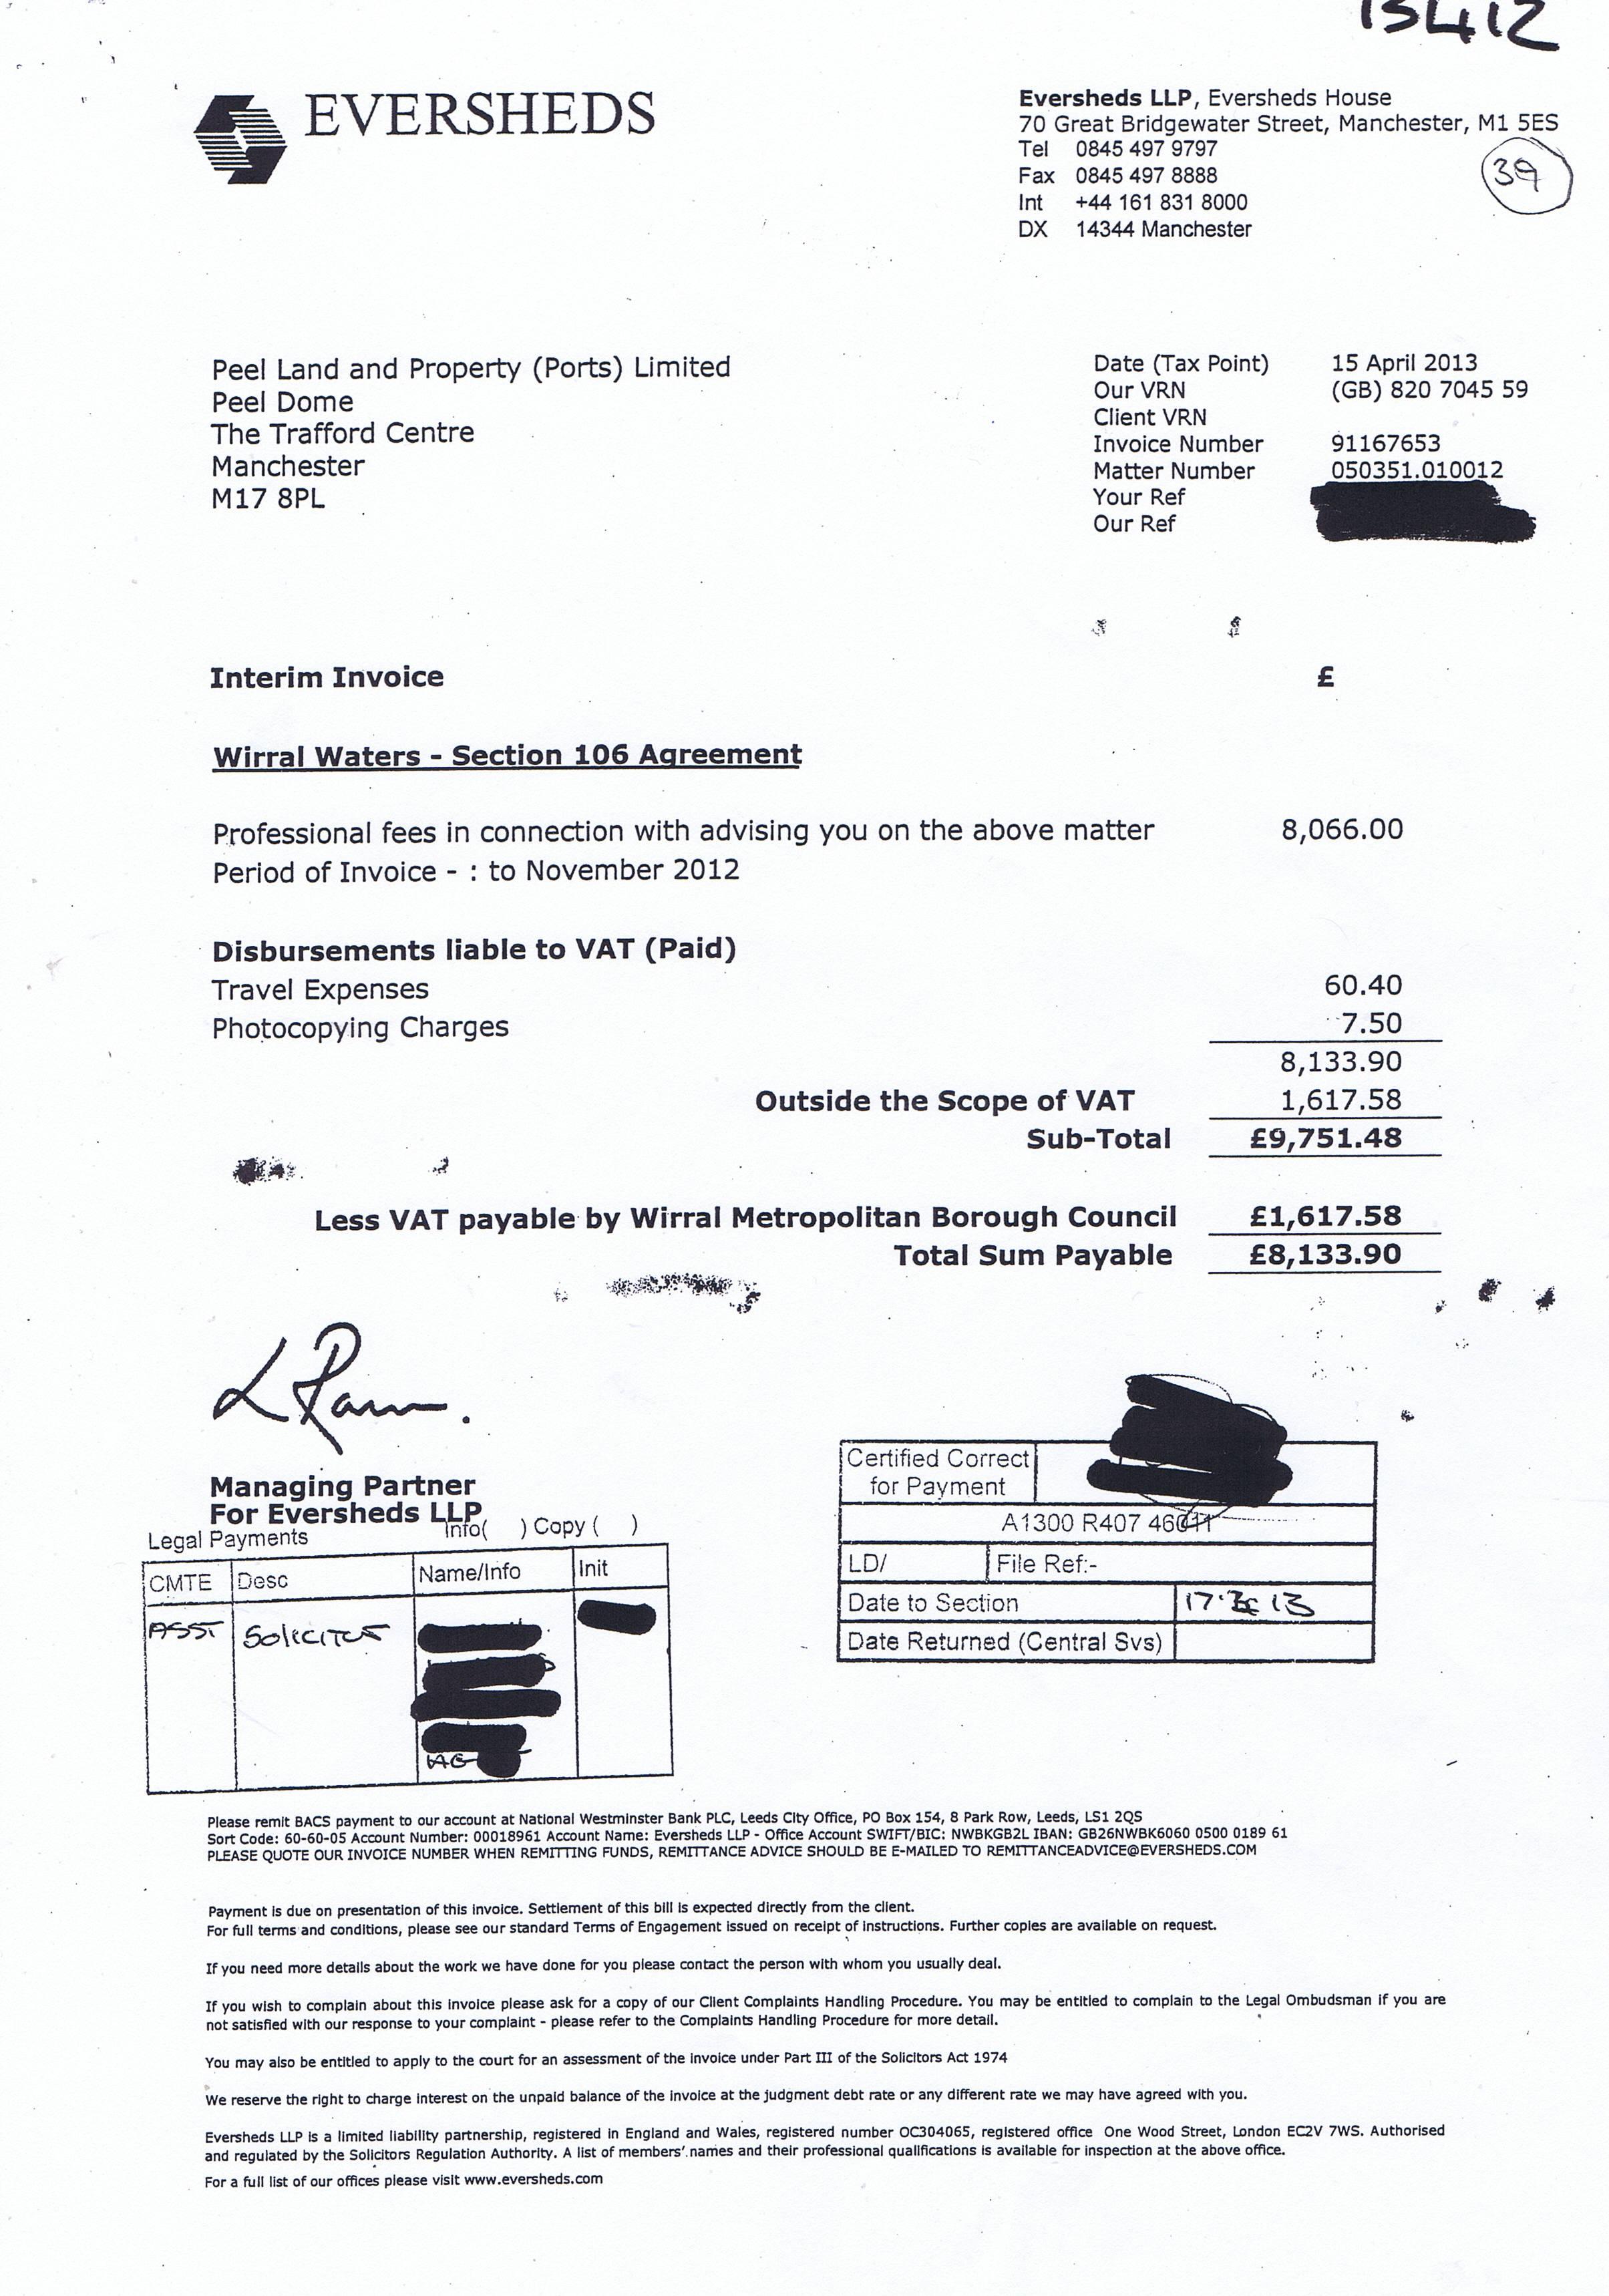 S106 Agreement Nivoteamfo